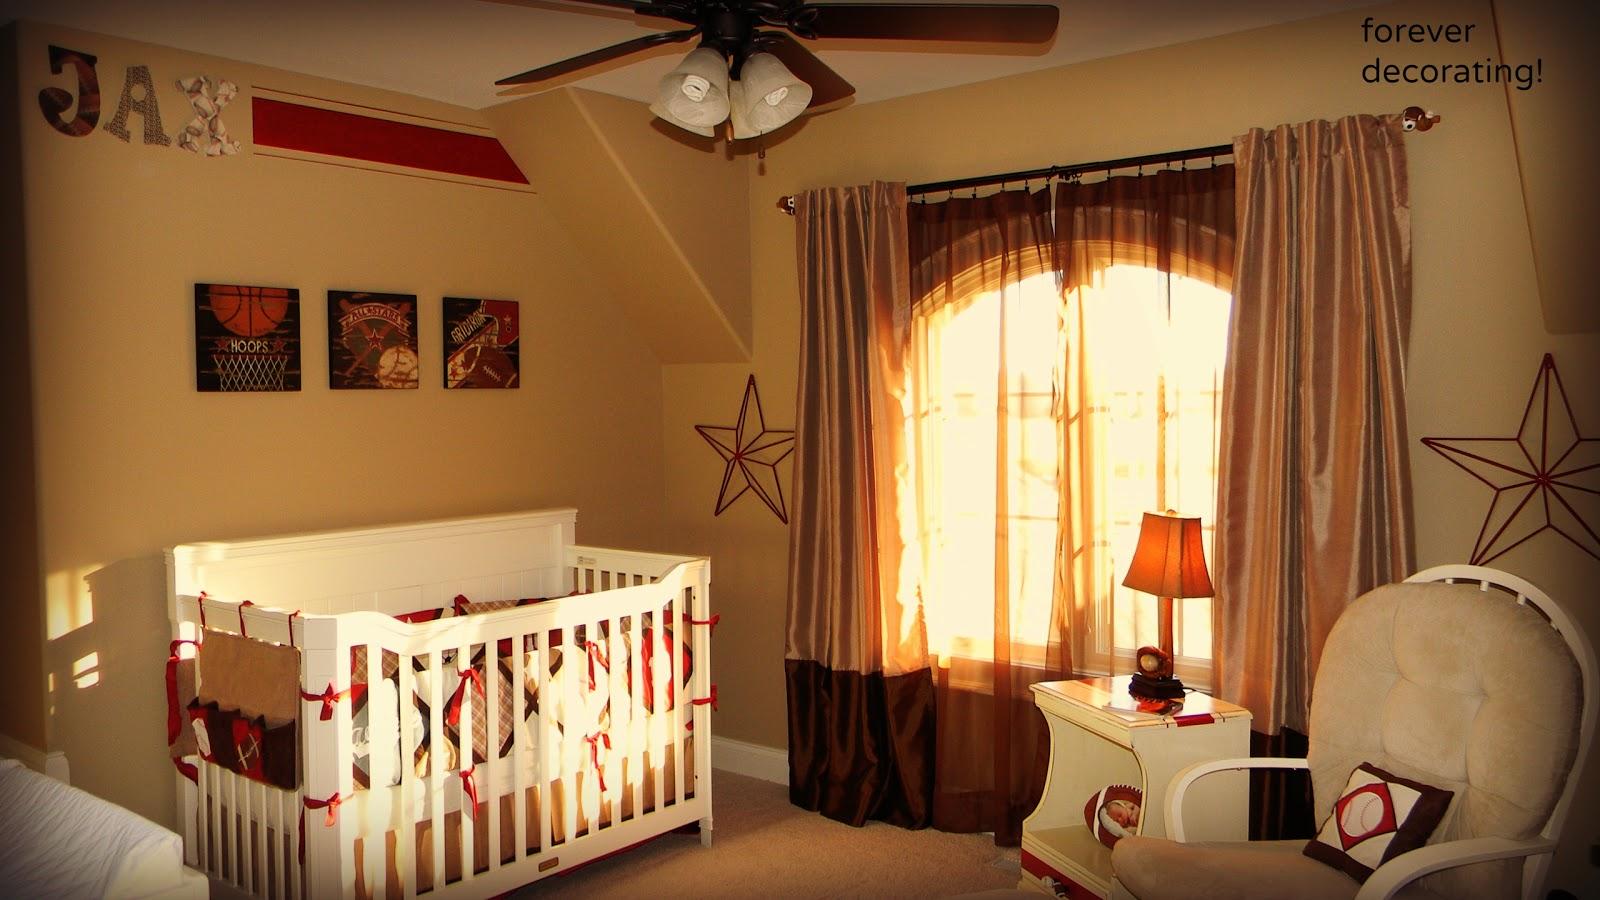 forever decorating sports theme nursery. Black Bedroom Furniture Sets. Home Design Ideas